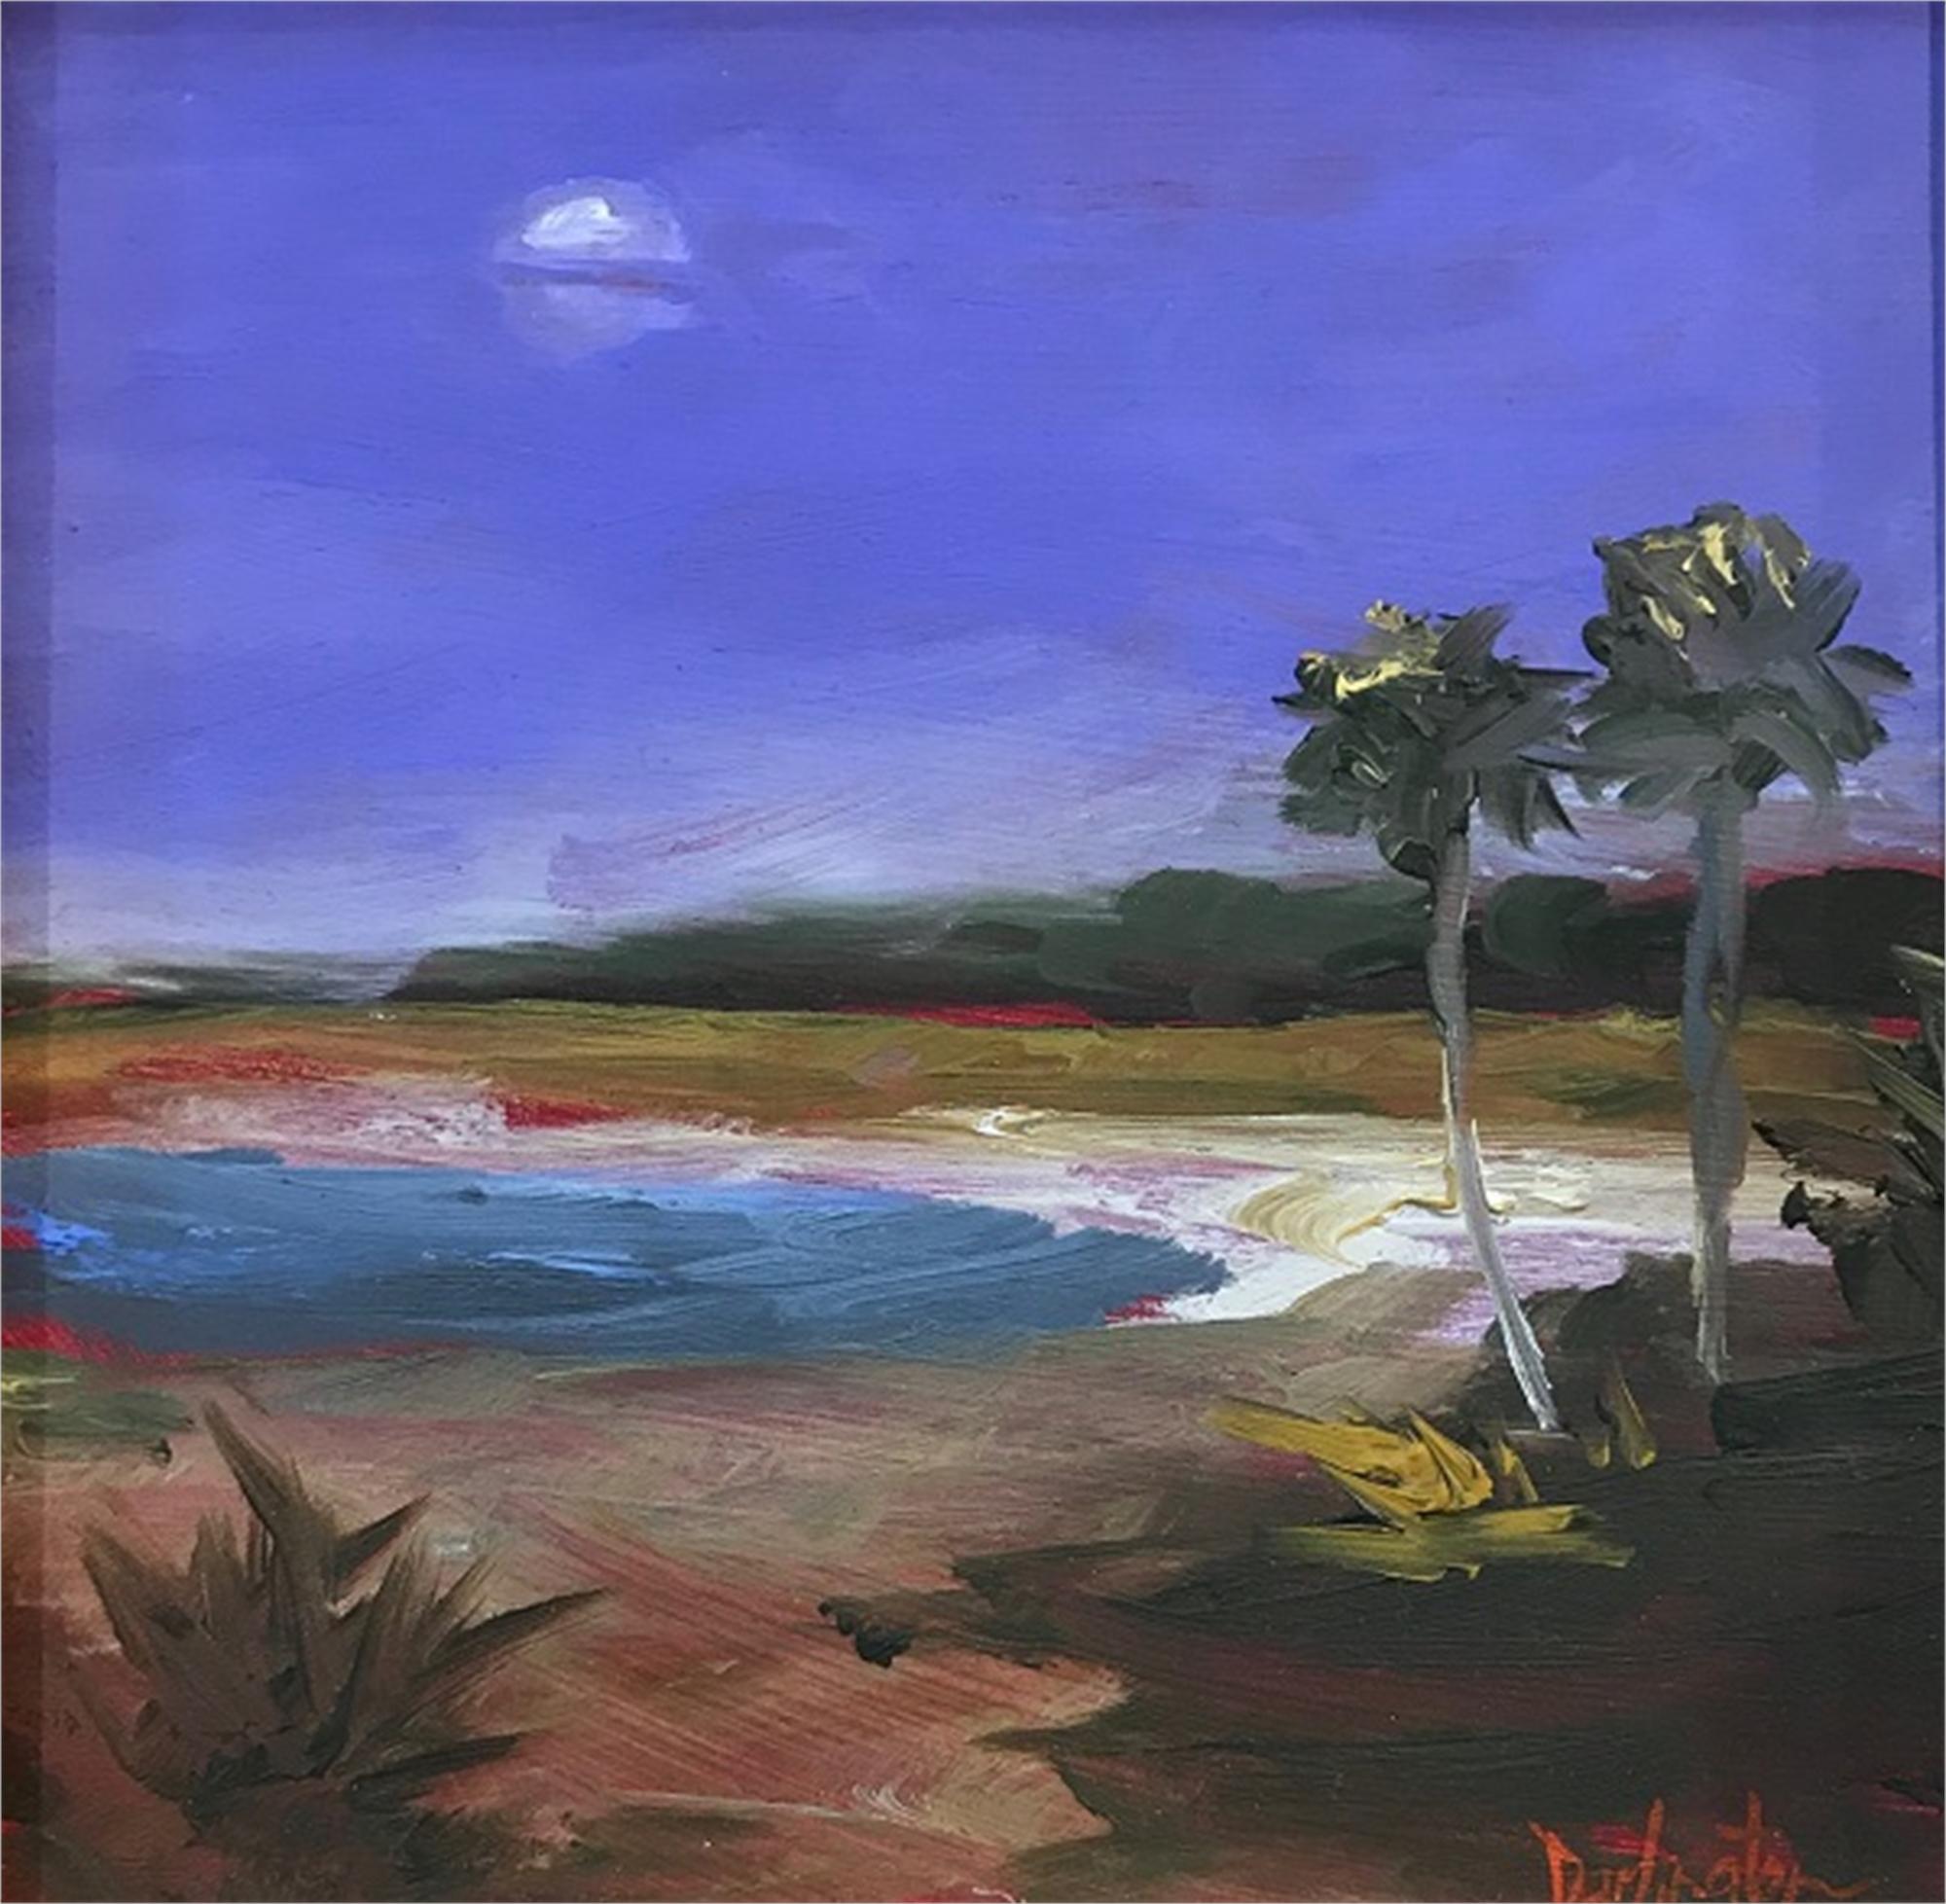 Moonlight on the Harbor by Jim Darlington